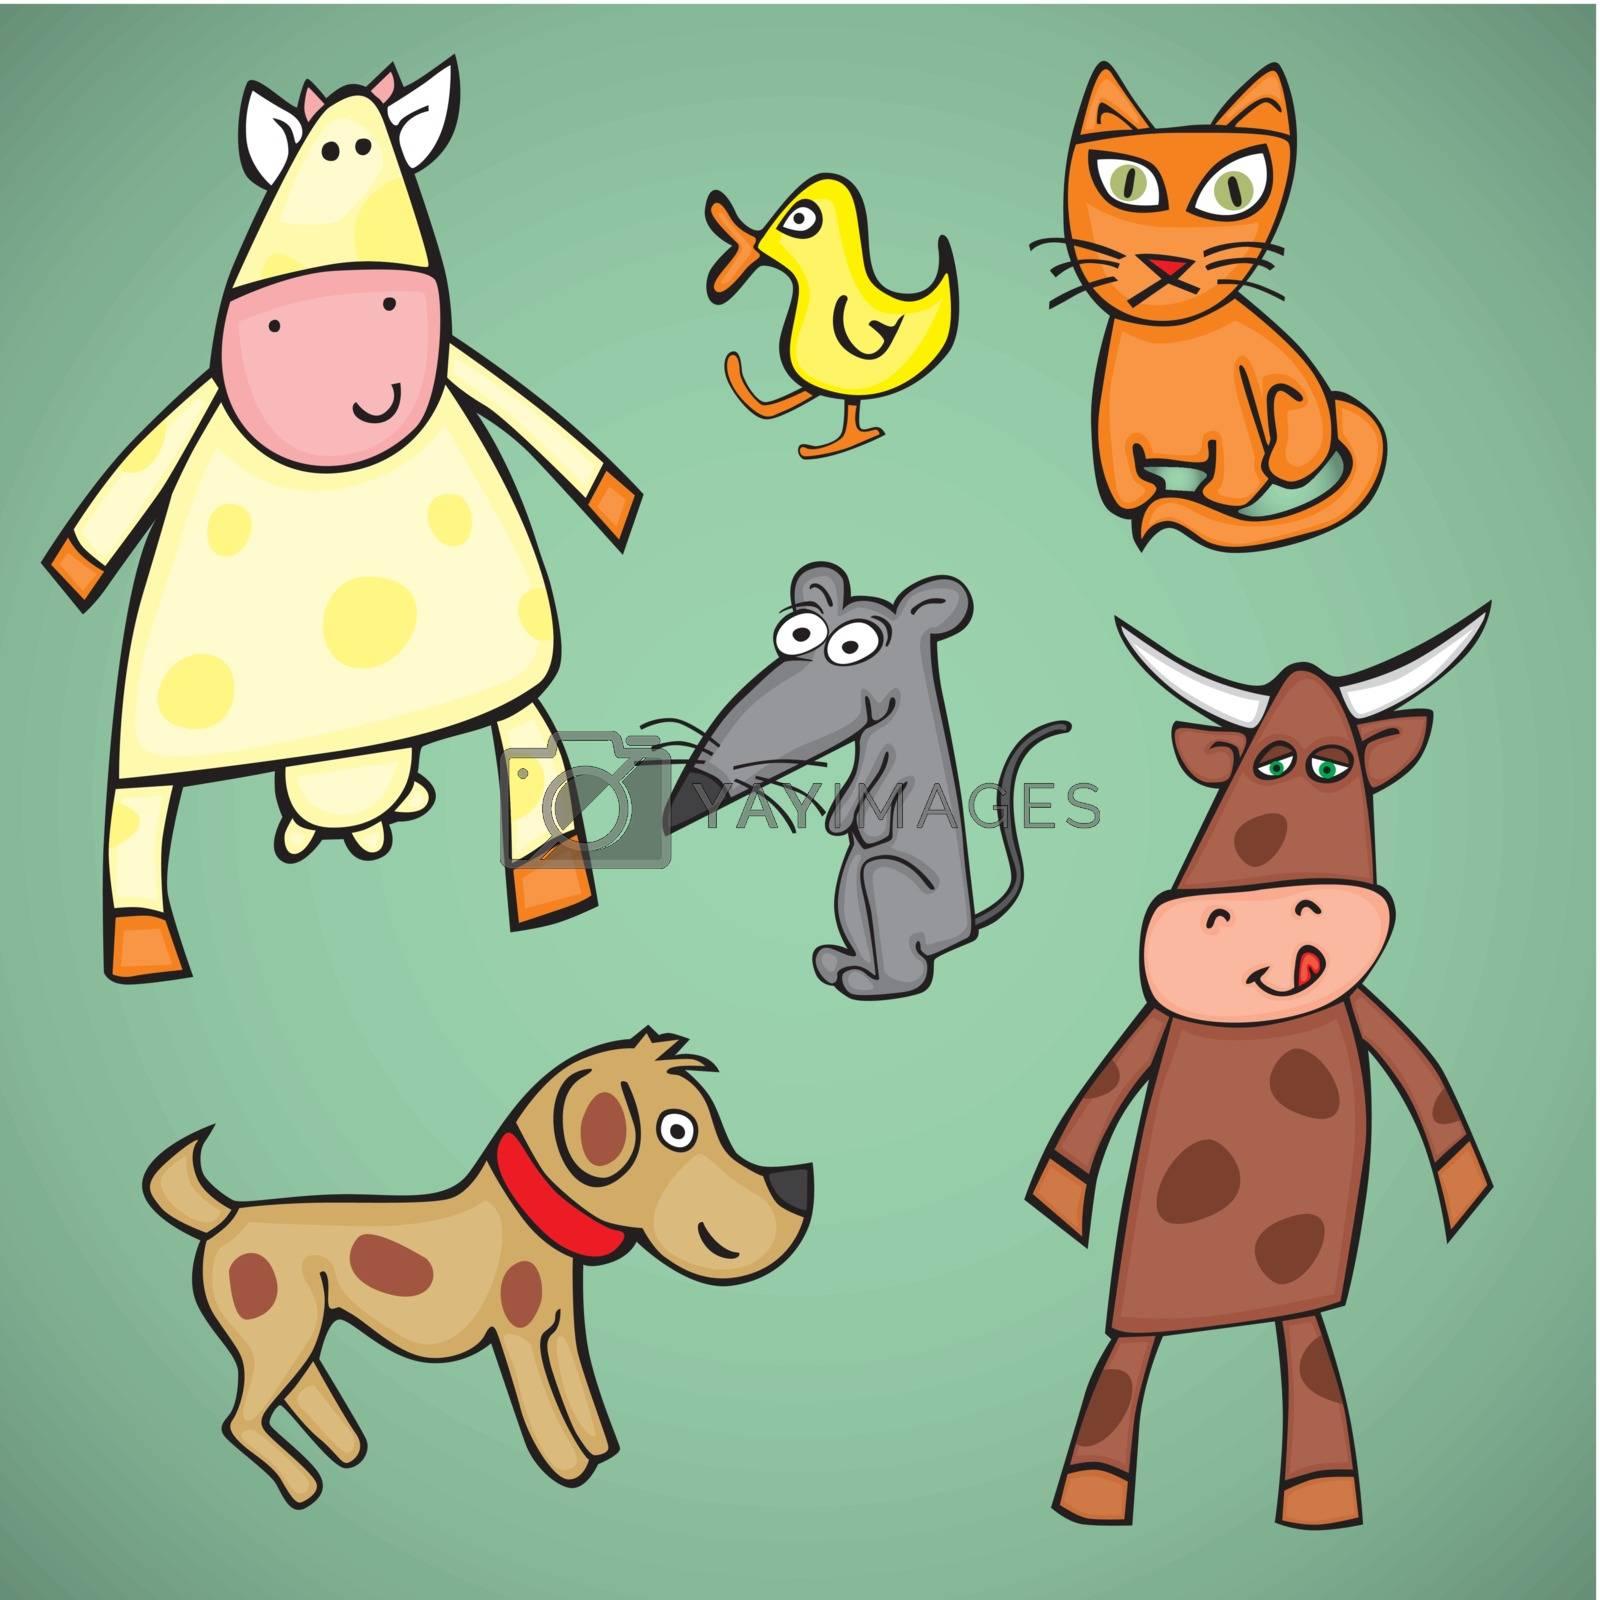 fully editable vector illustration animals